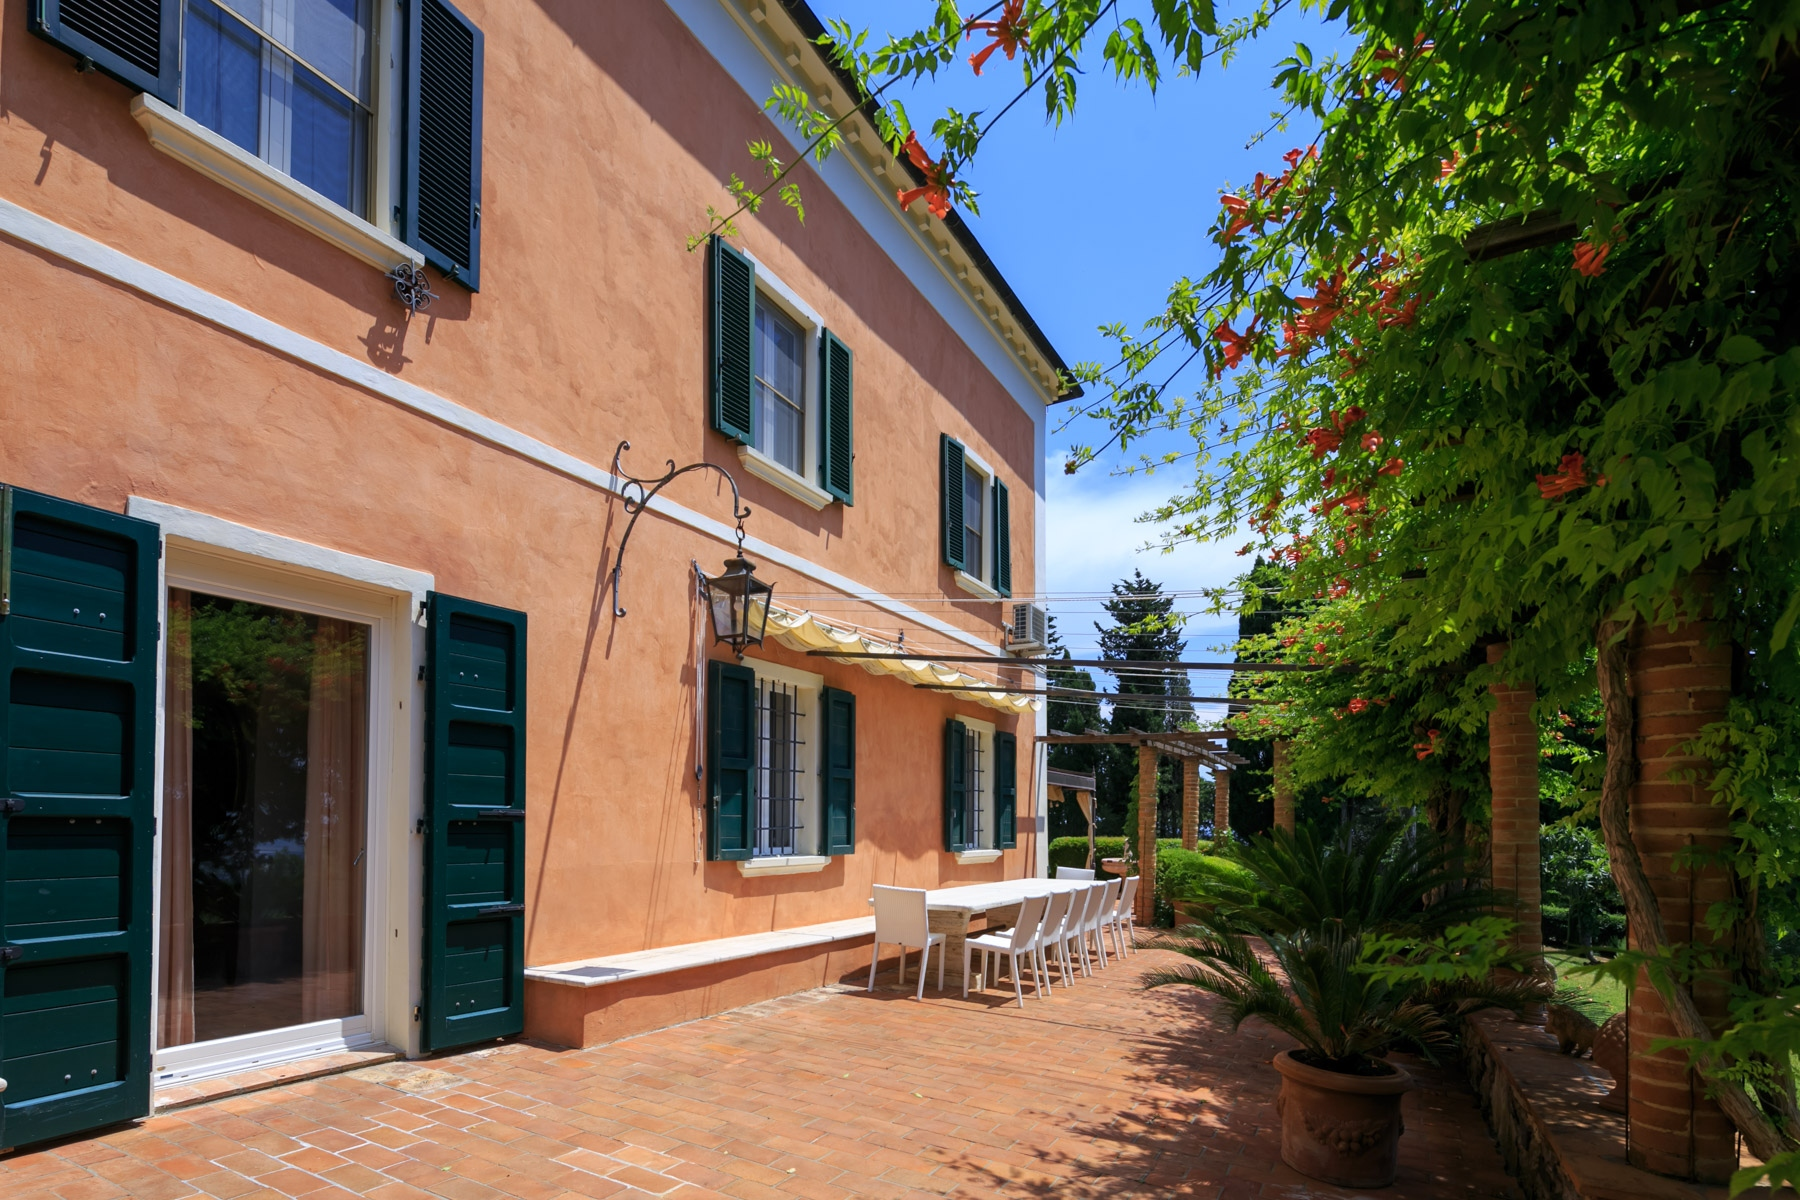 Villa in Vendita a Campiglia Marittima: 5 locali, 1100 mq - Foto 8